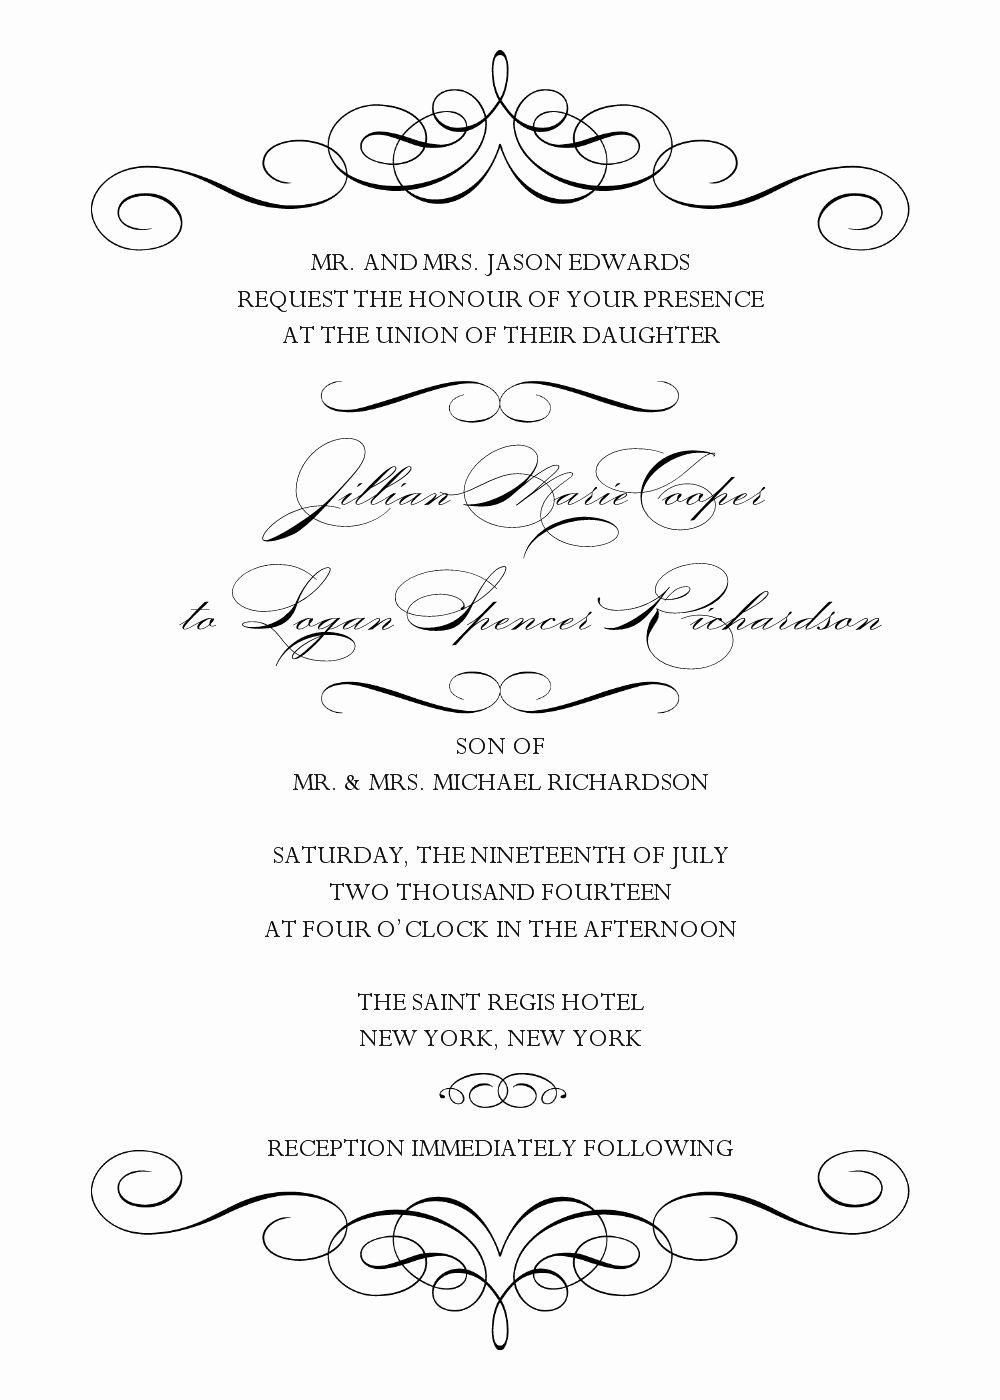 Microsoft Word Wedding Invitation Template Fresh Wedding Invitation Wedding Invitation Templates Word